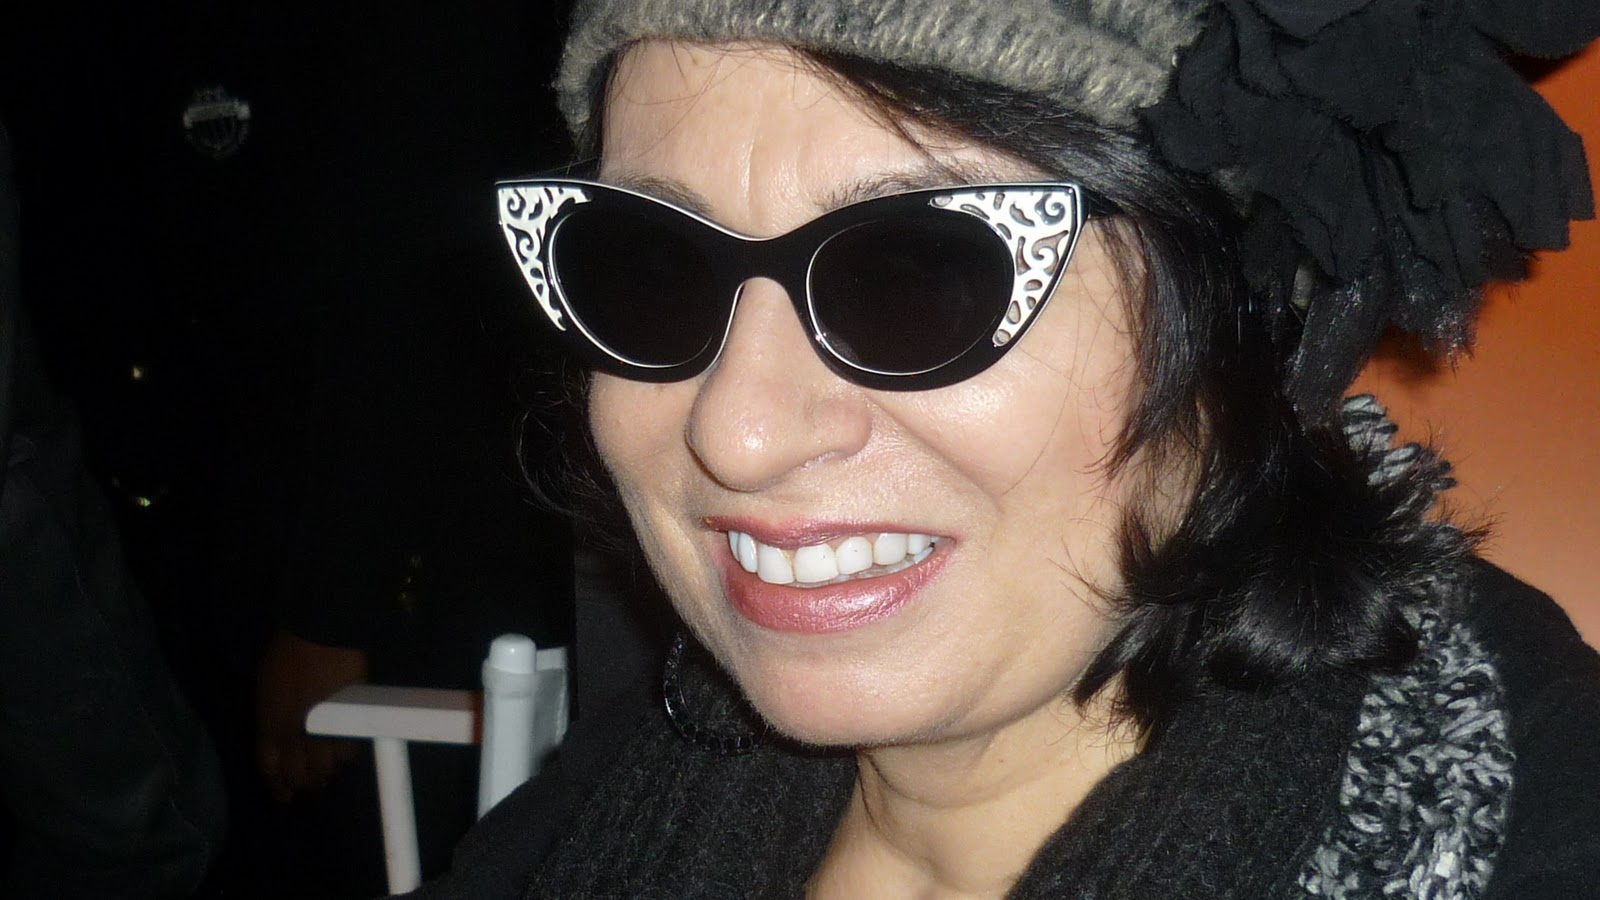 http://1.bp.blogspot.com/-A-P97B12h8c/TWR-KdnYBkI/AAAAAAAADI4/HvQobYlIyLM/s1600/Anneinpolaroids.JPG